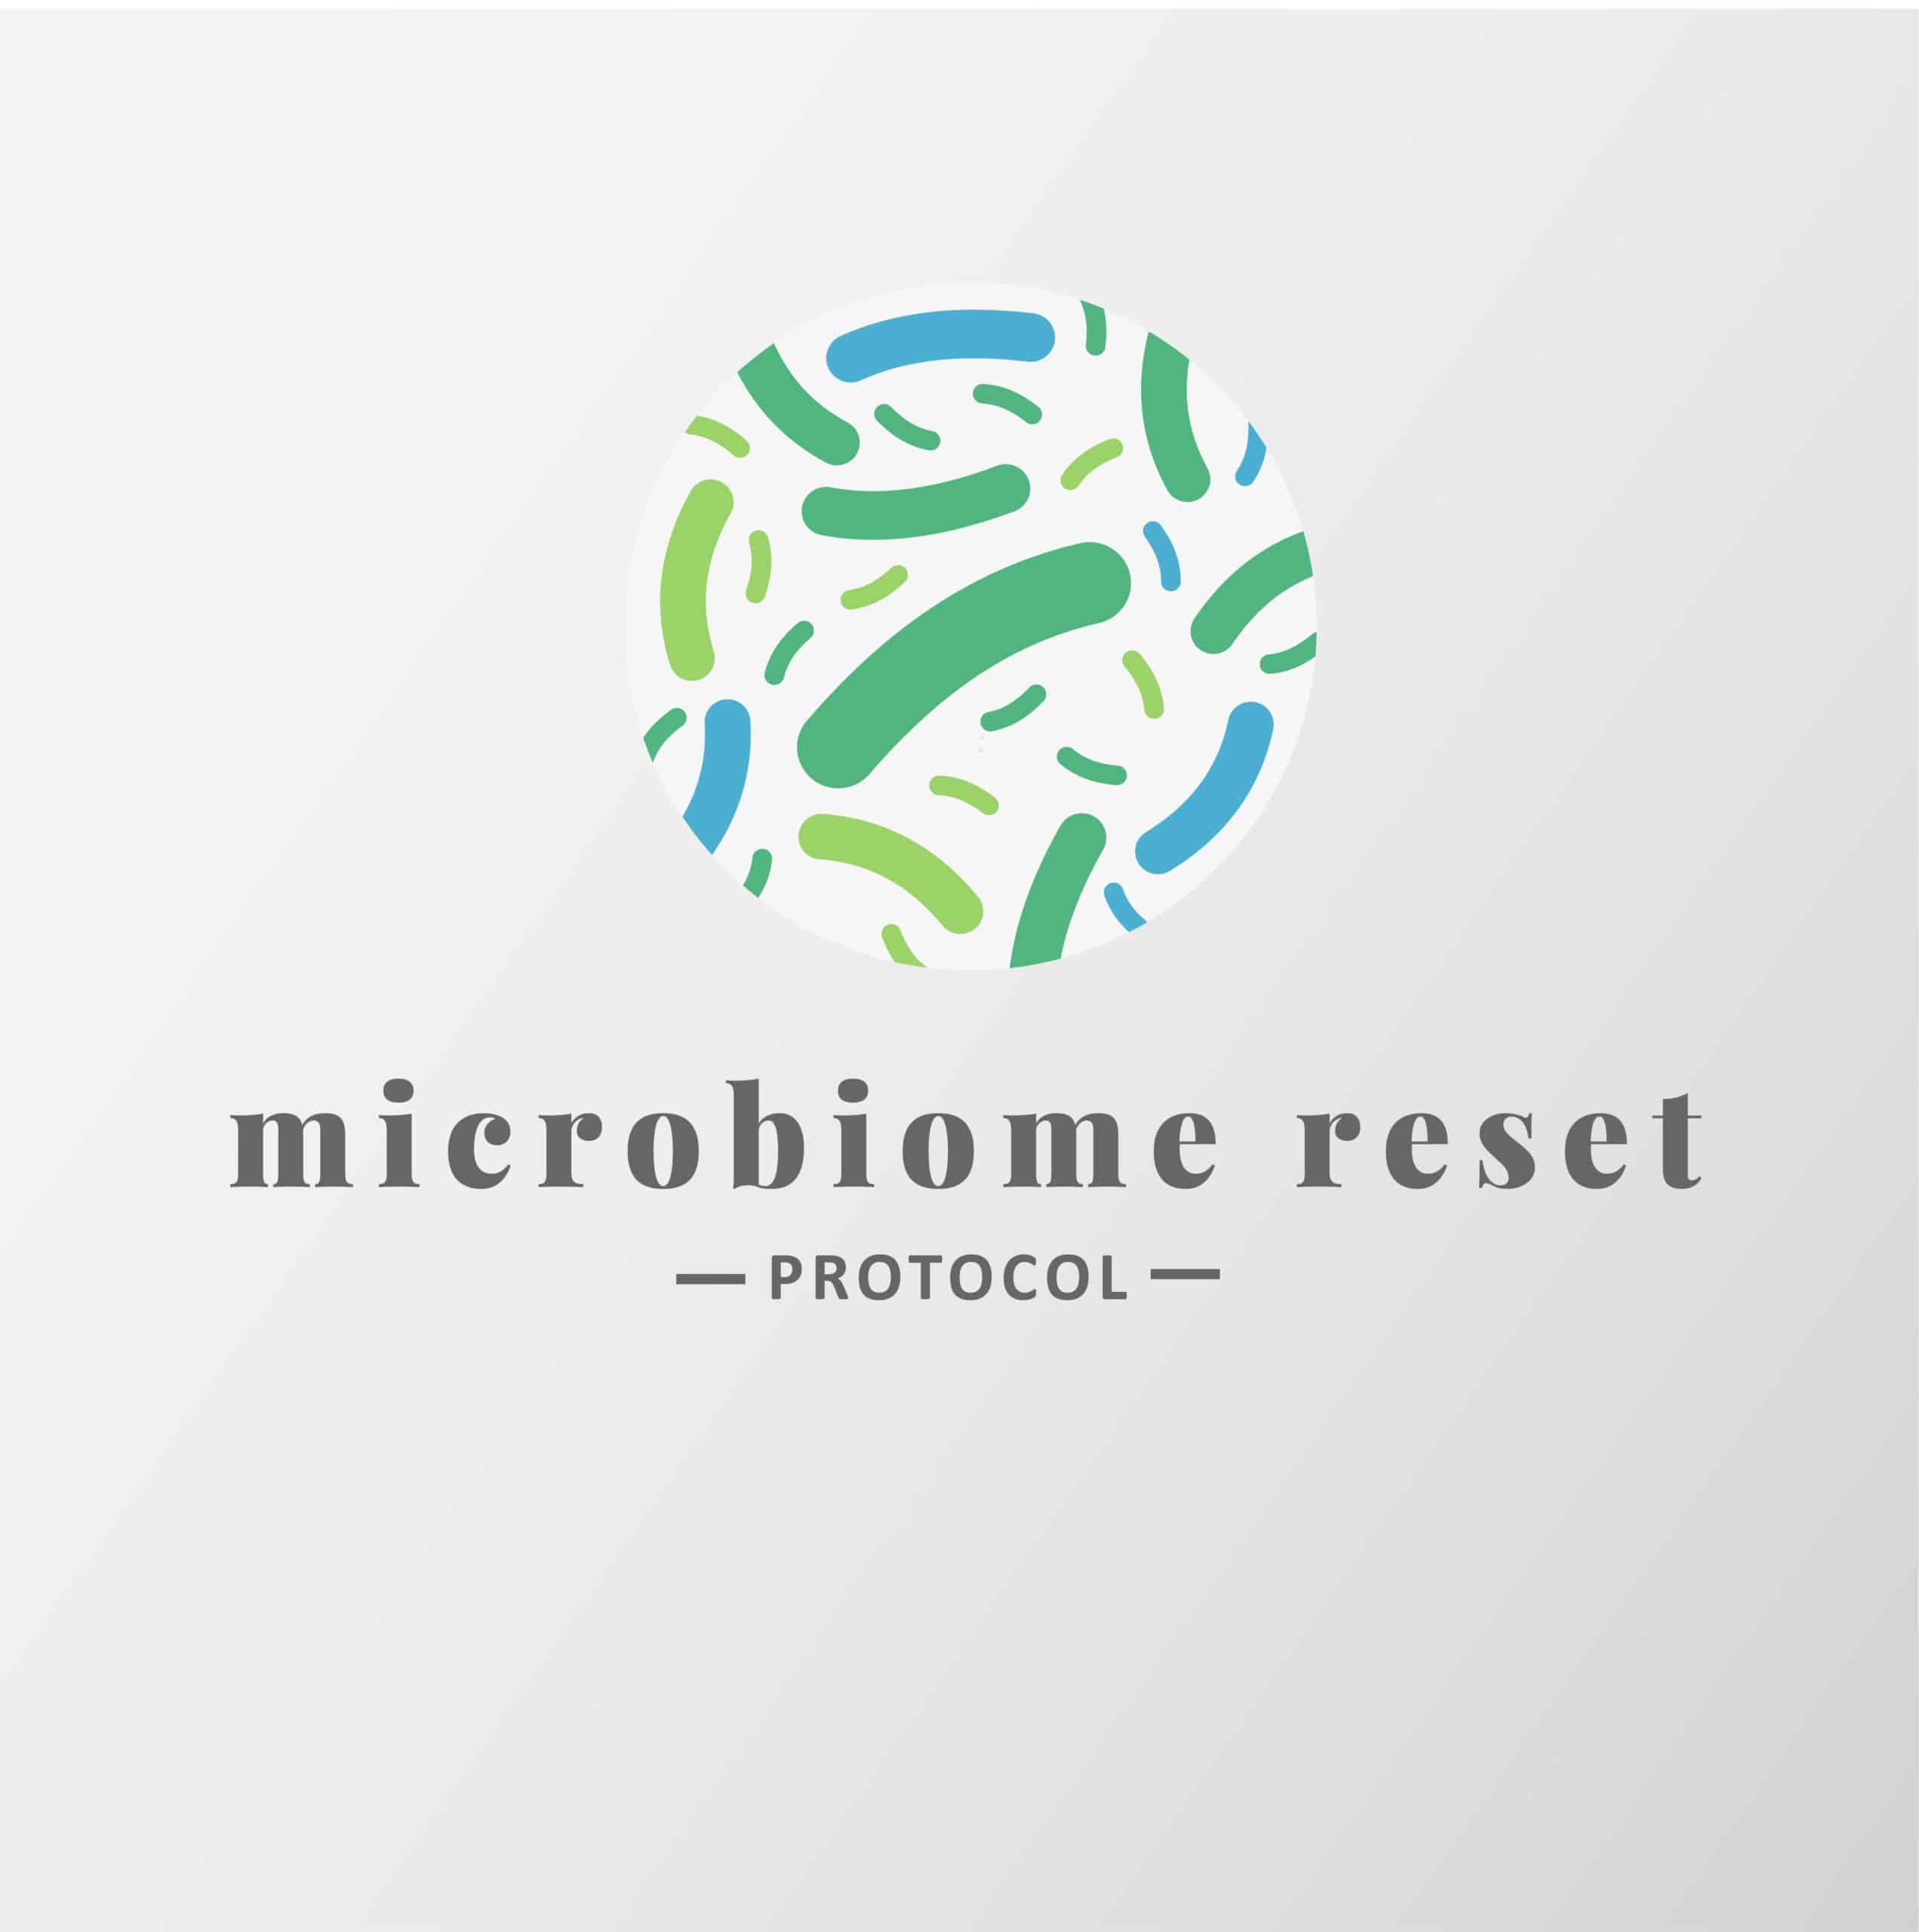 Microbiome Reset Protocol